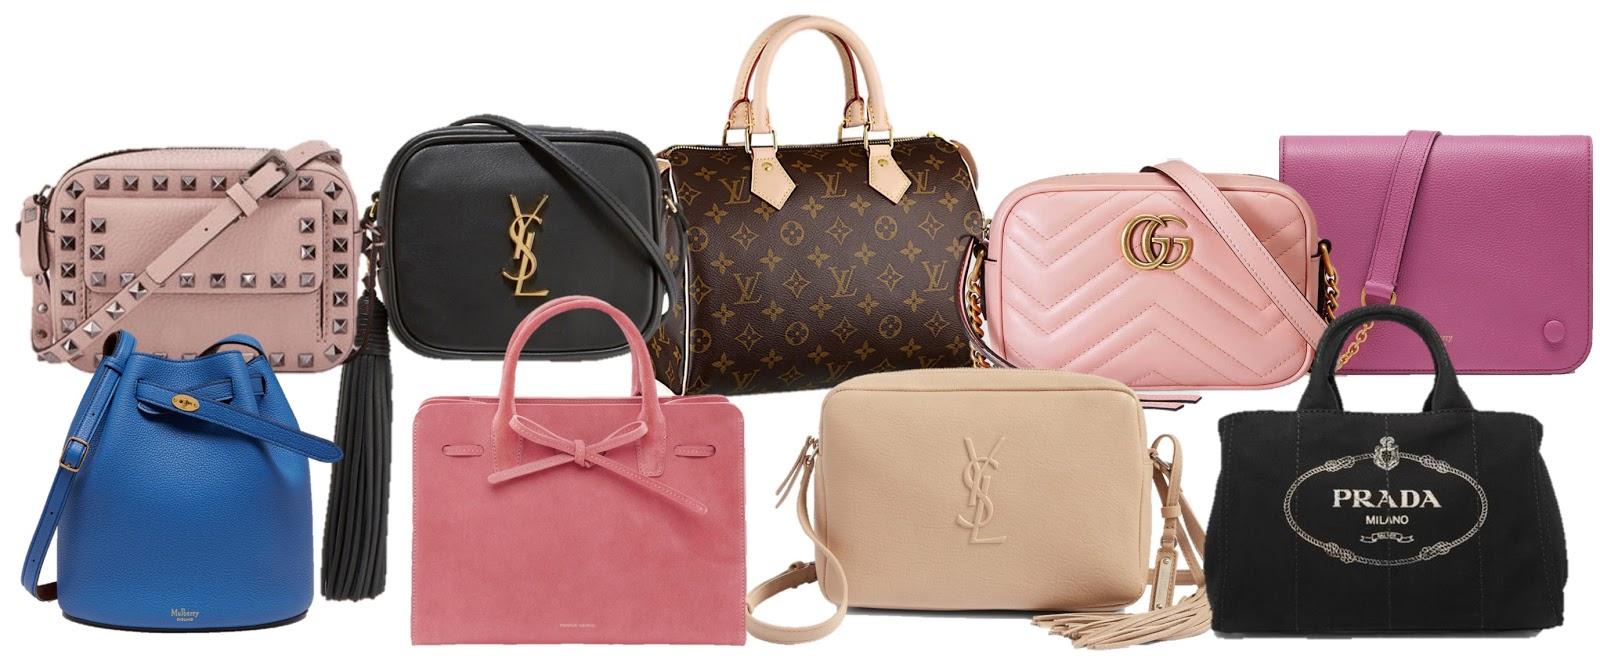 The Best Designer Bags Under $1000